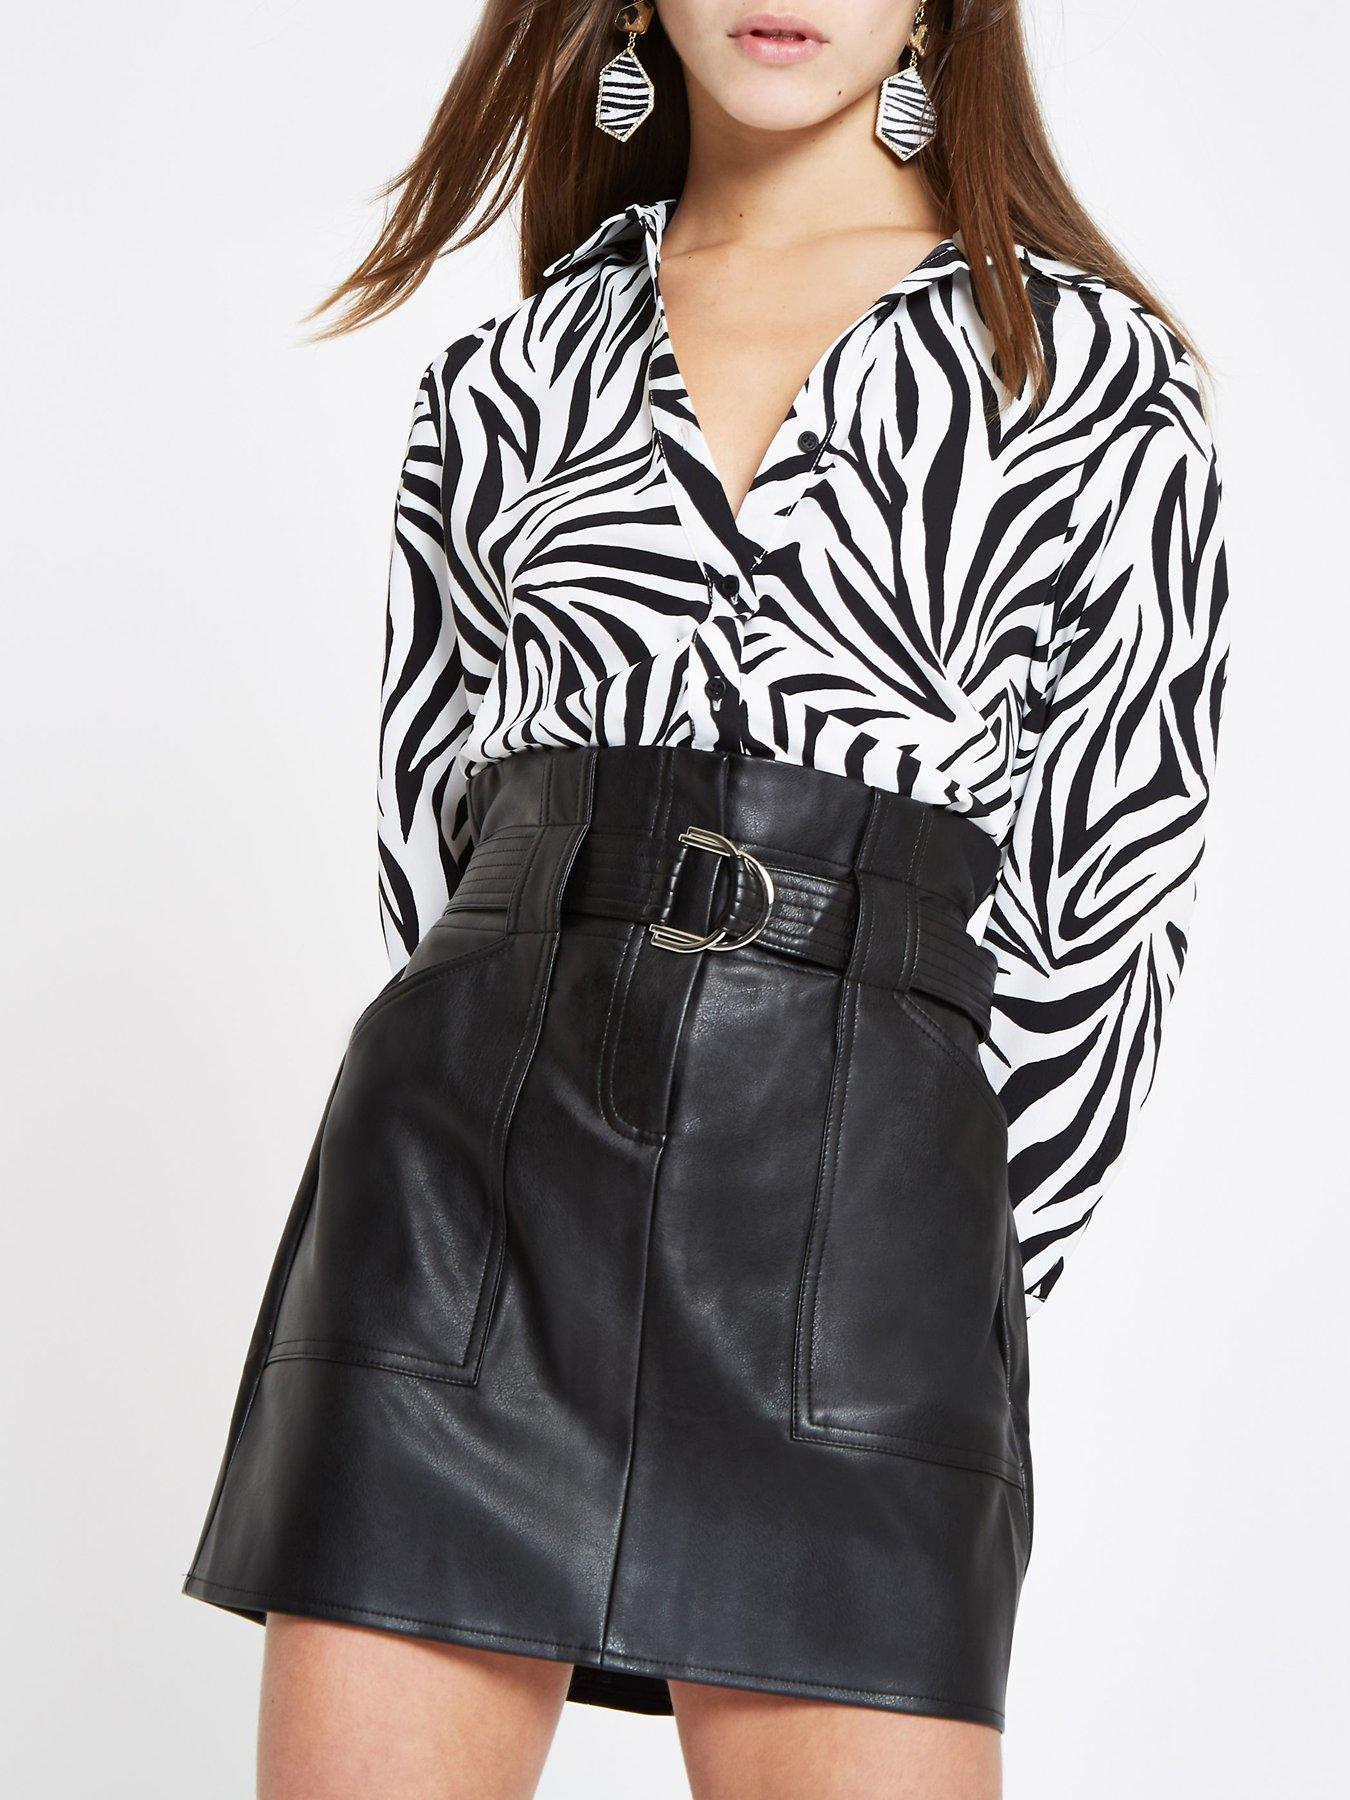 Skirts Women's Clothing Beautiful Black Faux Leather Size 12 River Island Mini Skirt